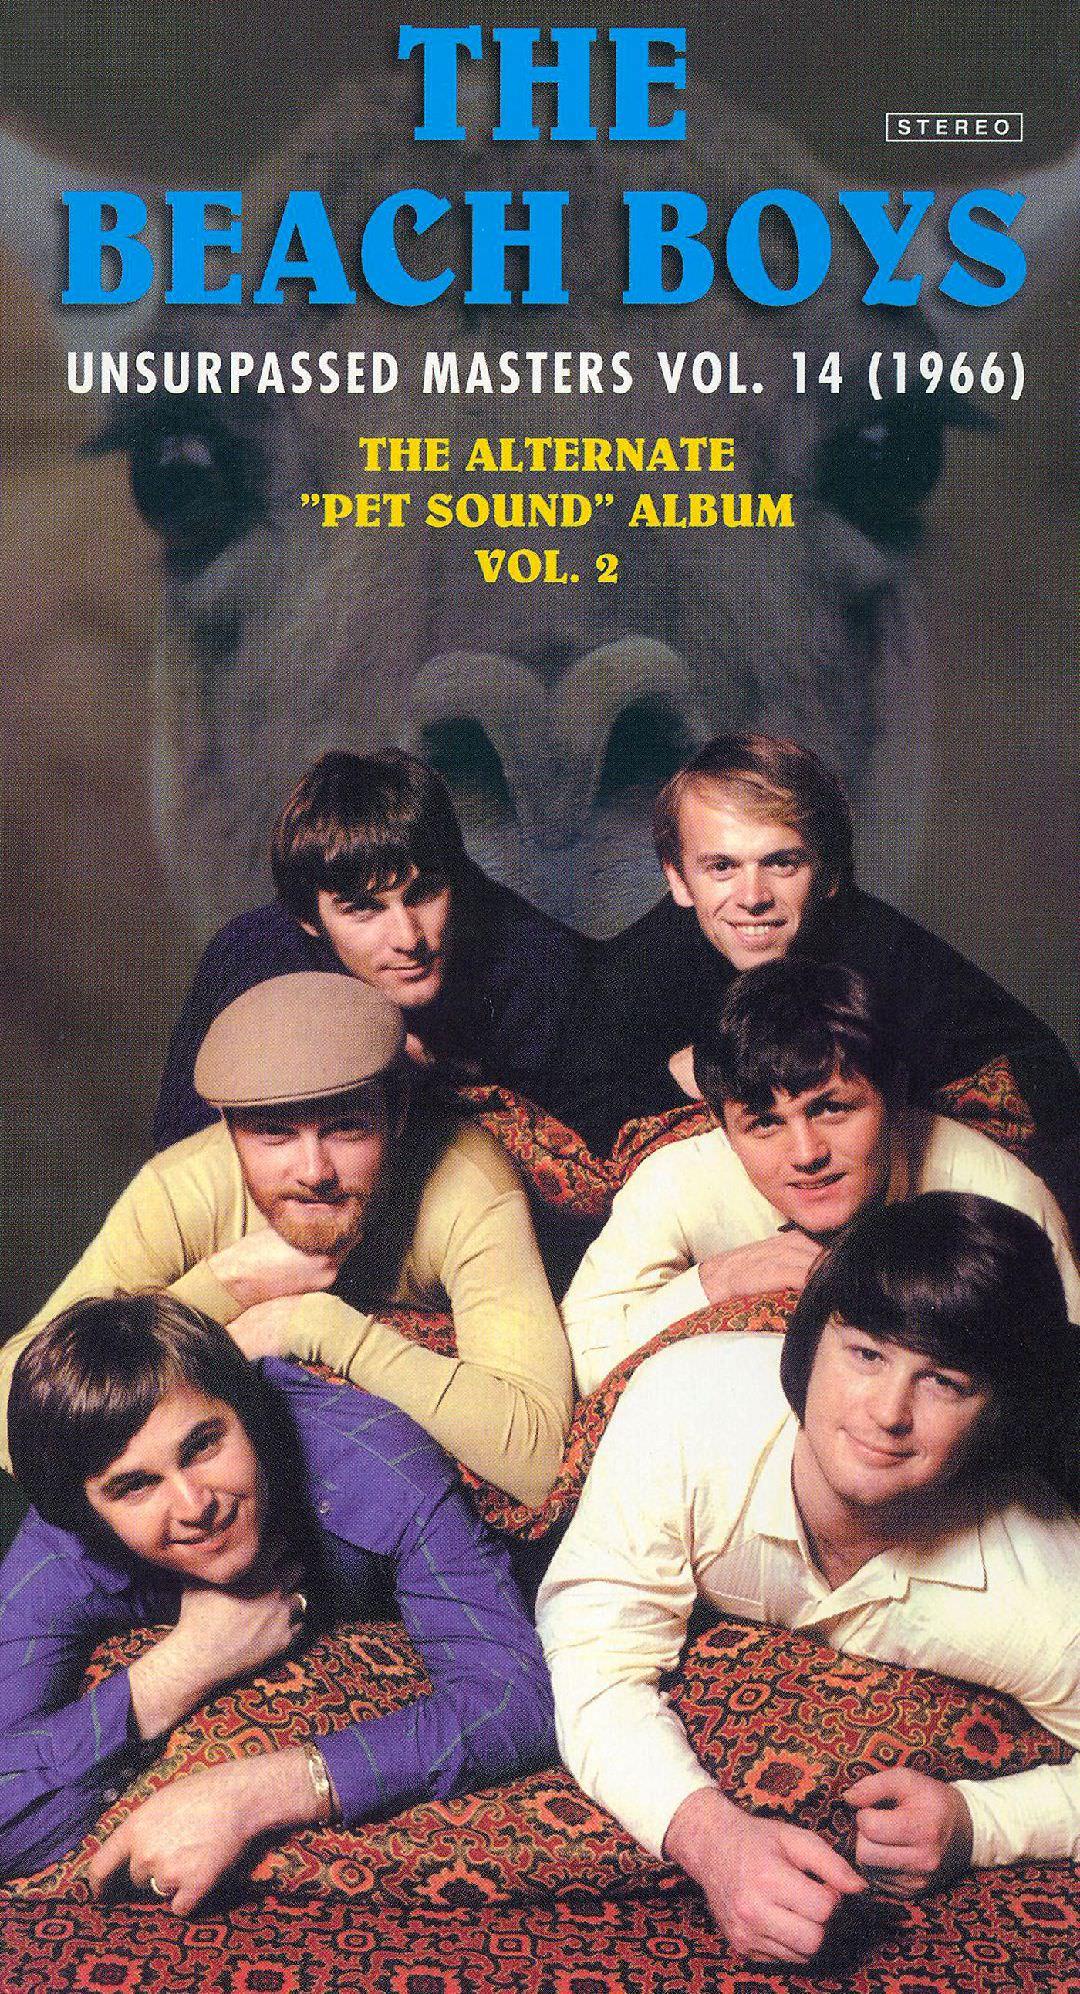 Unsurpassed Masters Vol. 14 (1966) cover